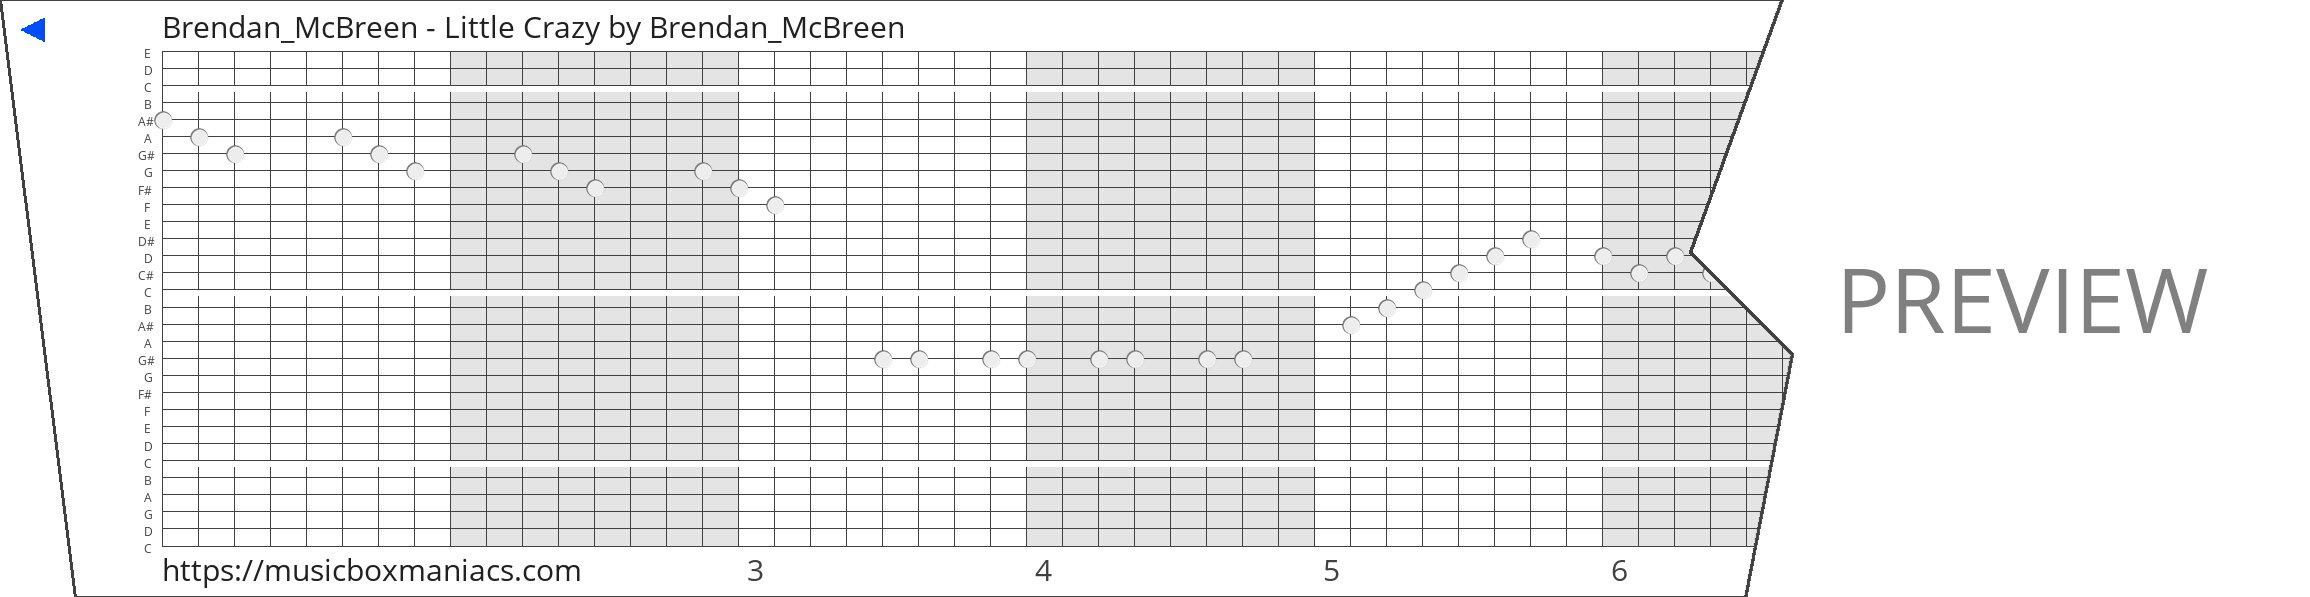 Brendan_McBreen - Little Crazy 30 note music box paper strip